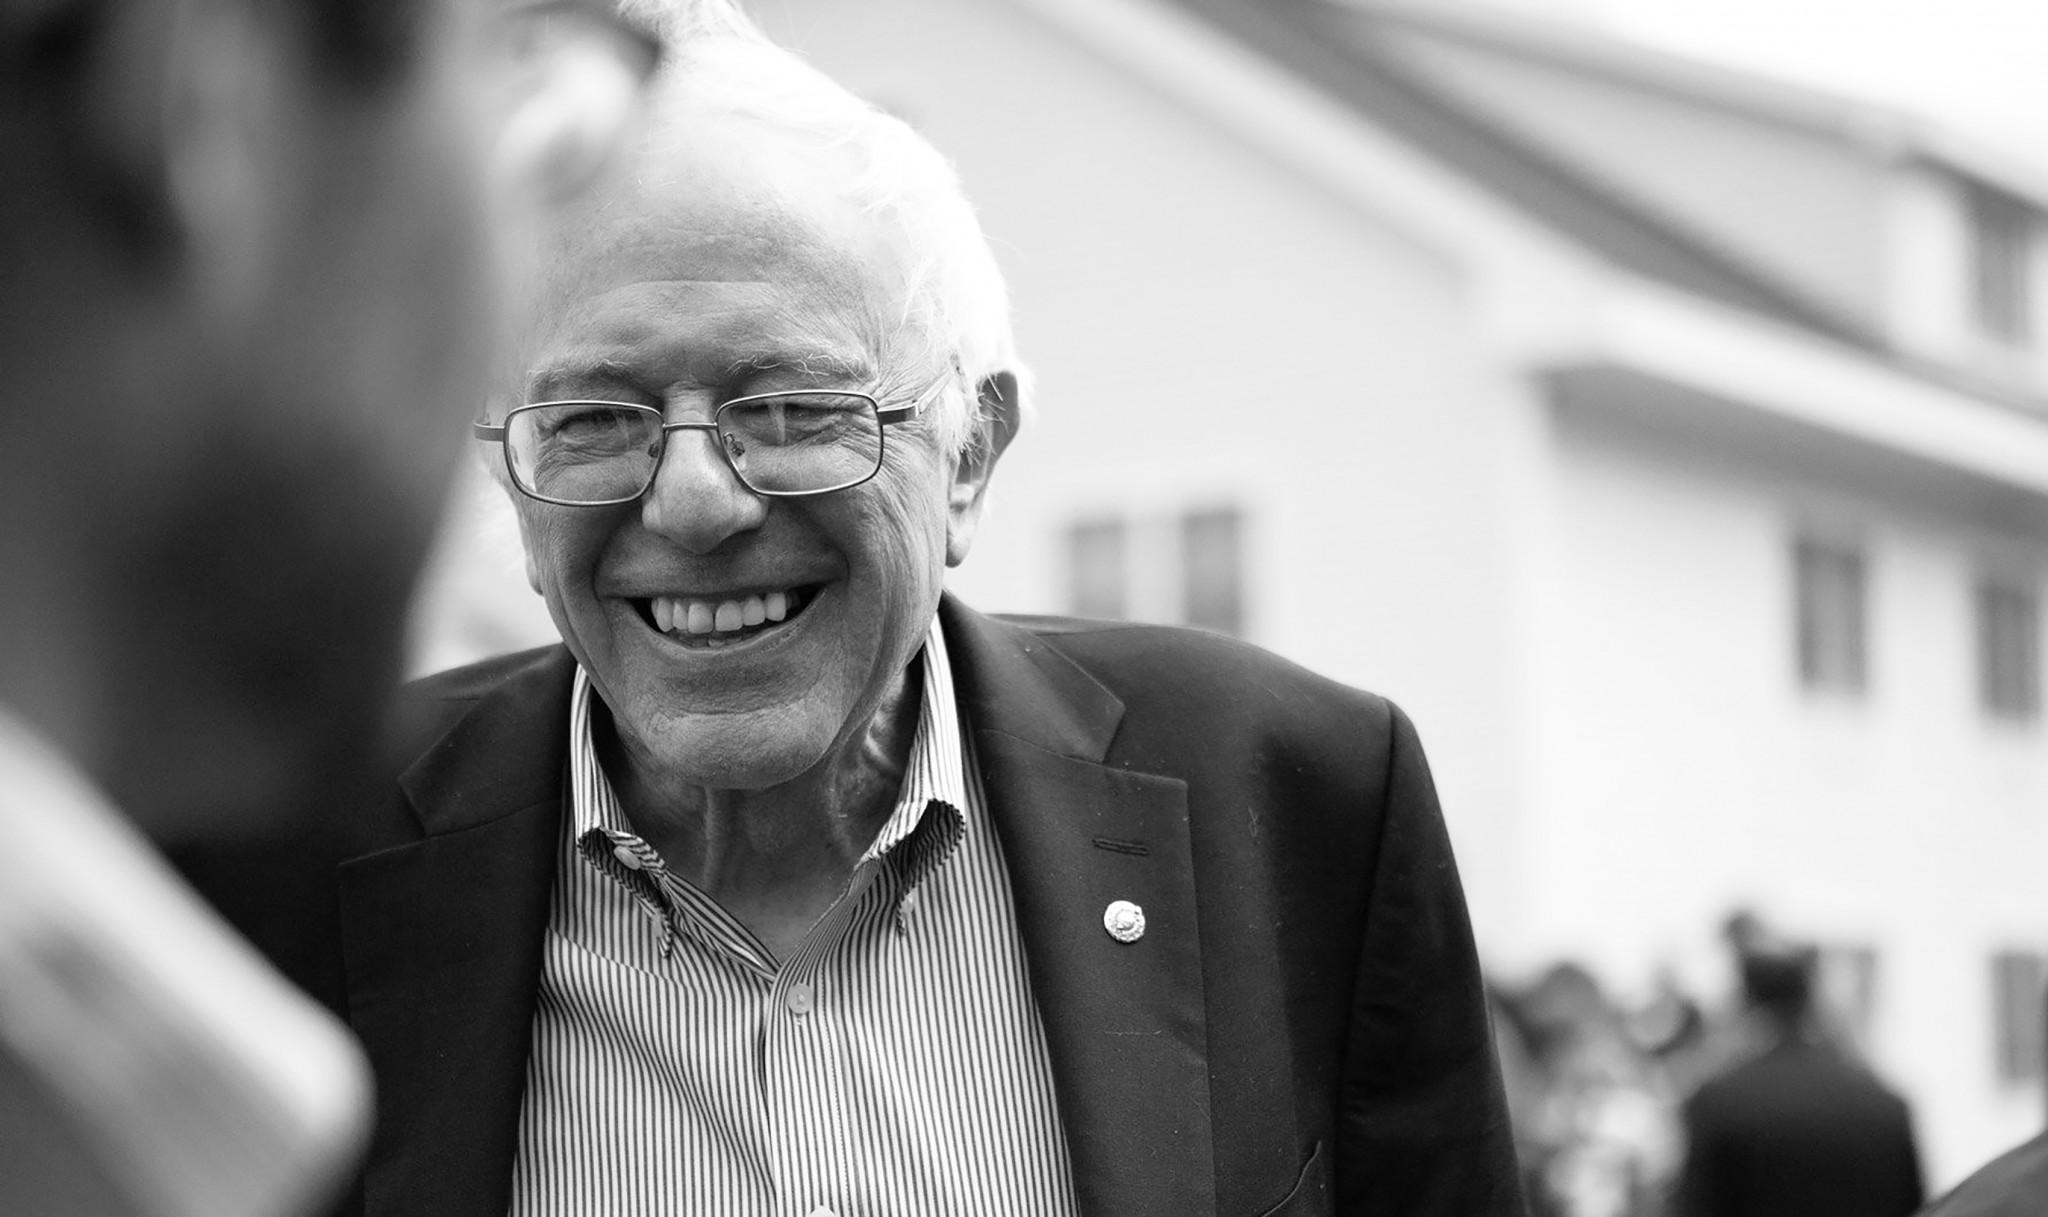 Courtesy of Bernie Sanders' Campaign